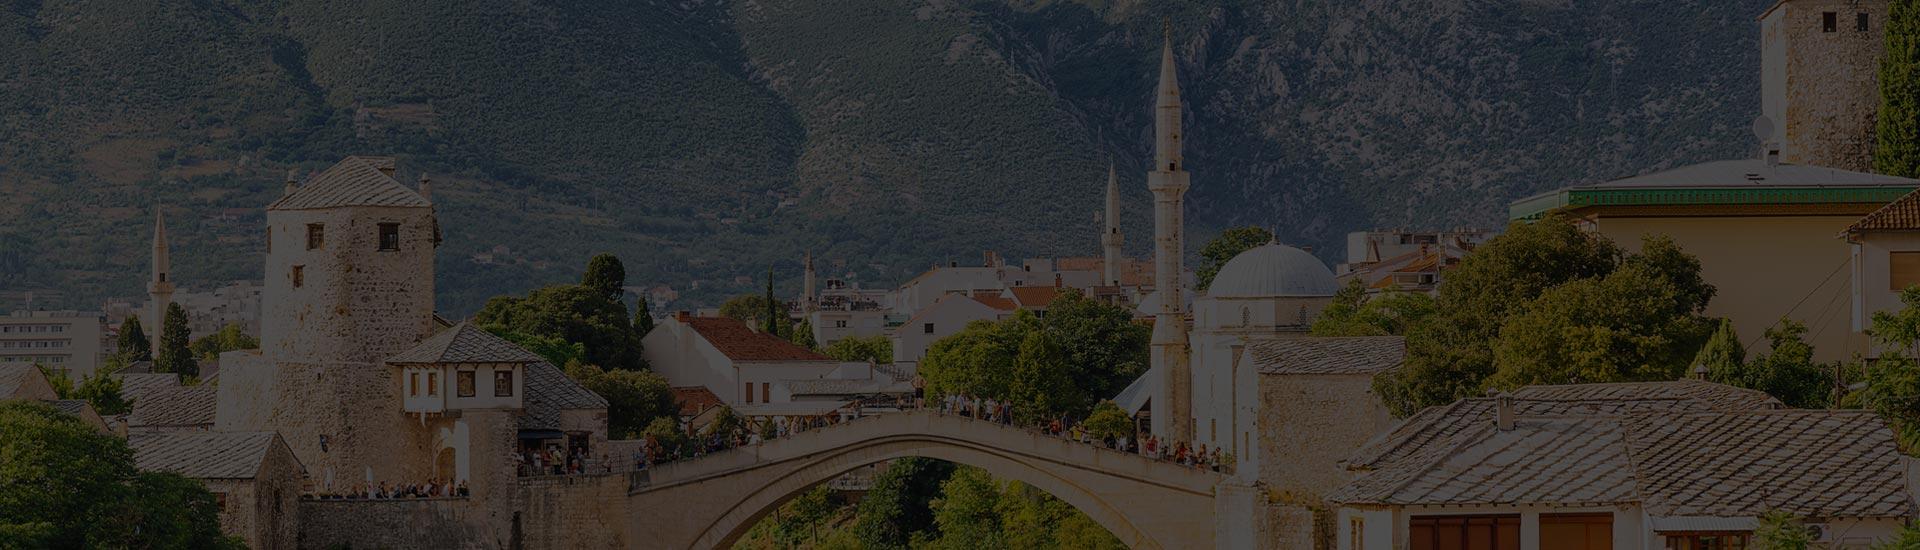 Logistikunternehmen-Bosnien-Herzegowina